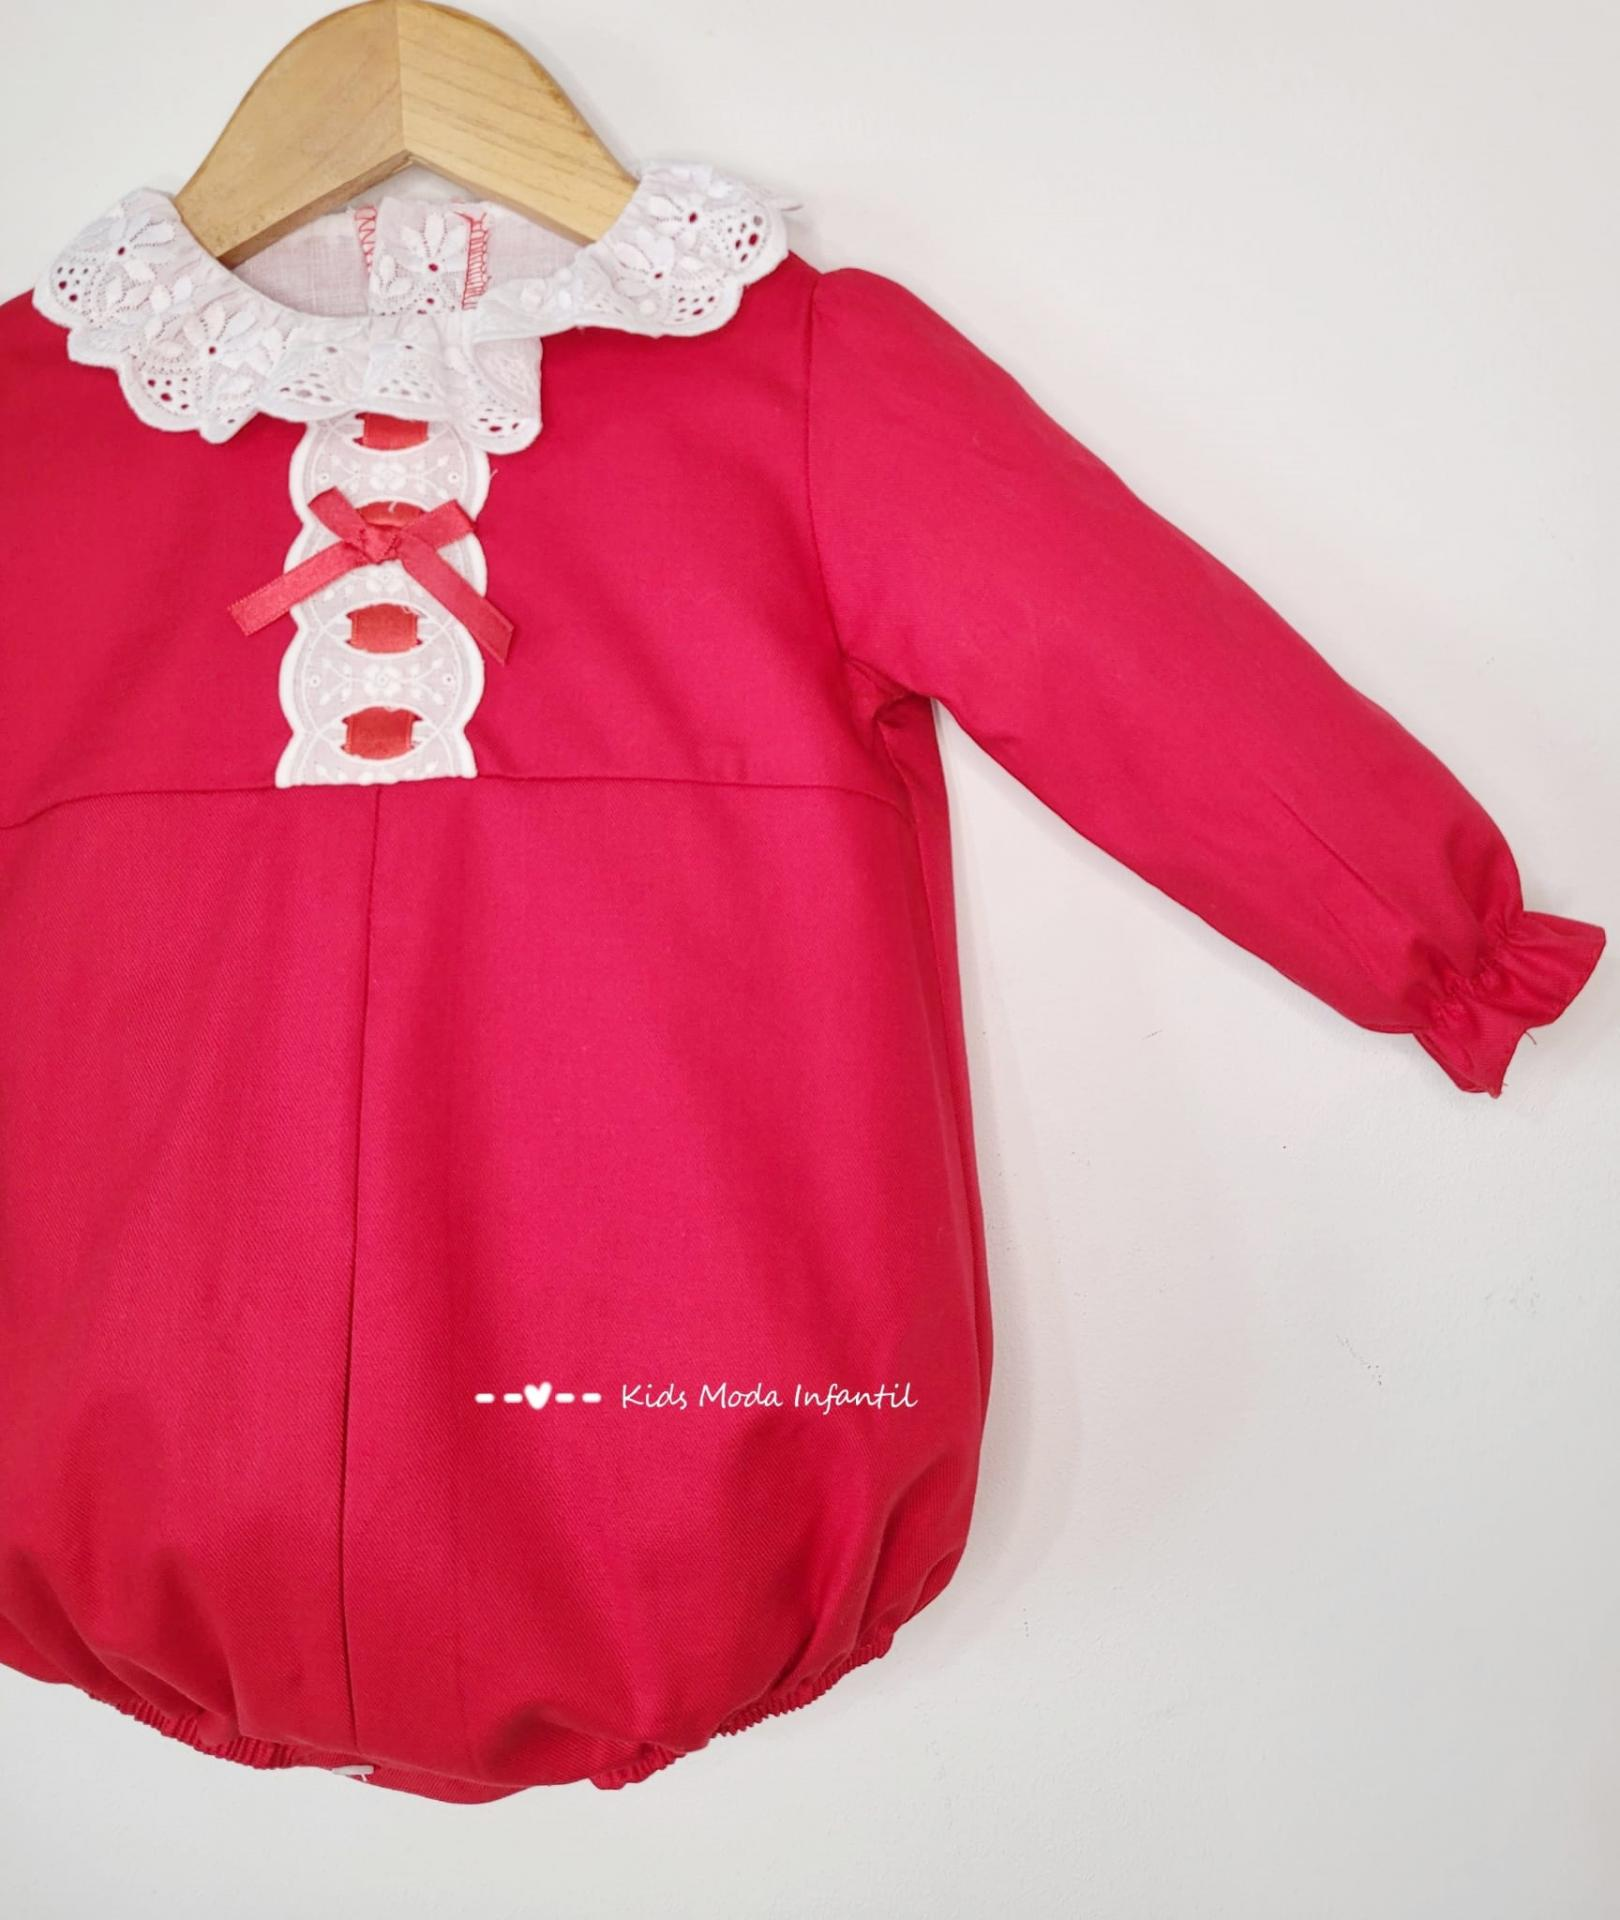 Pelele bebe vestir rojo de Eva Class